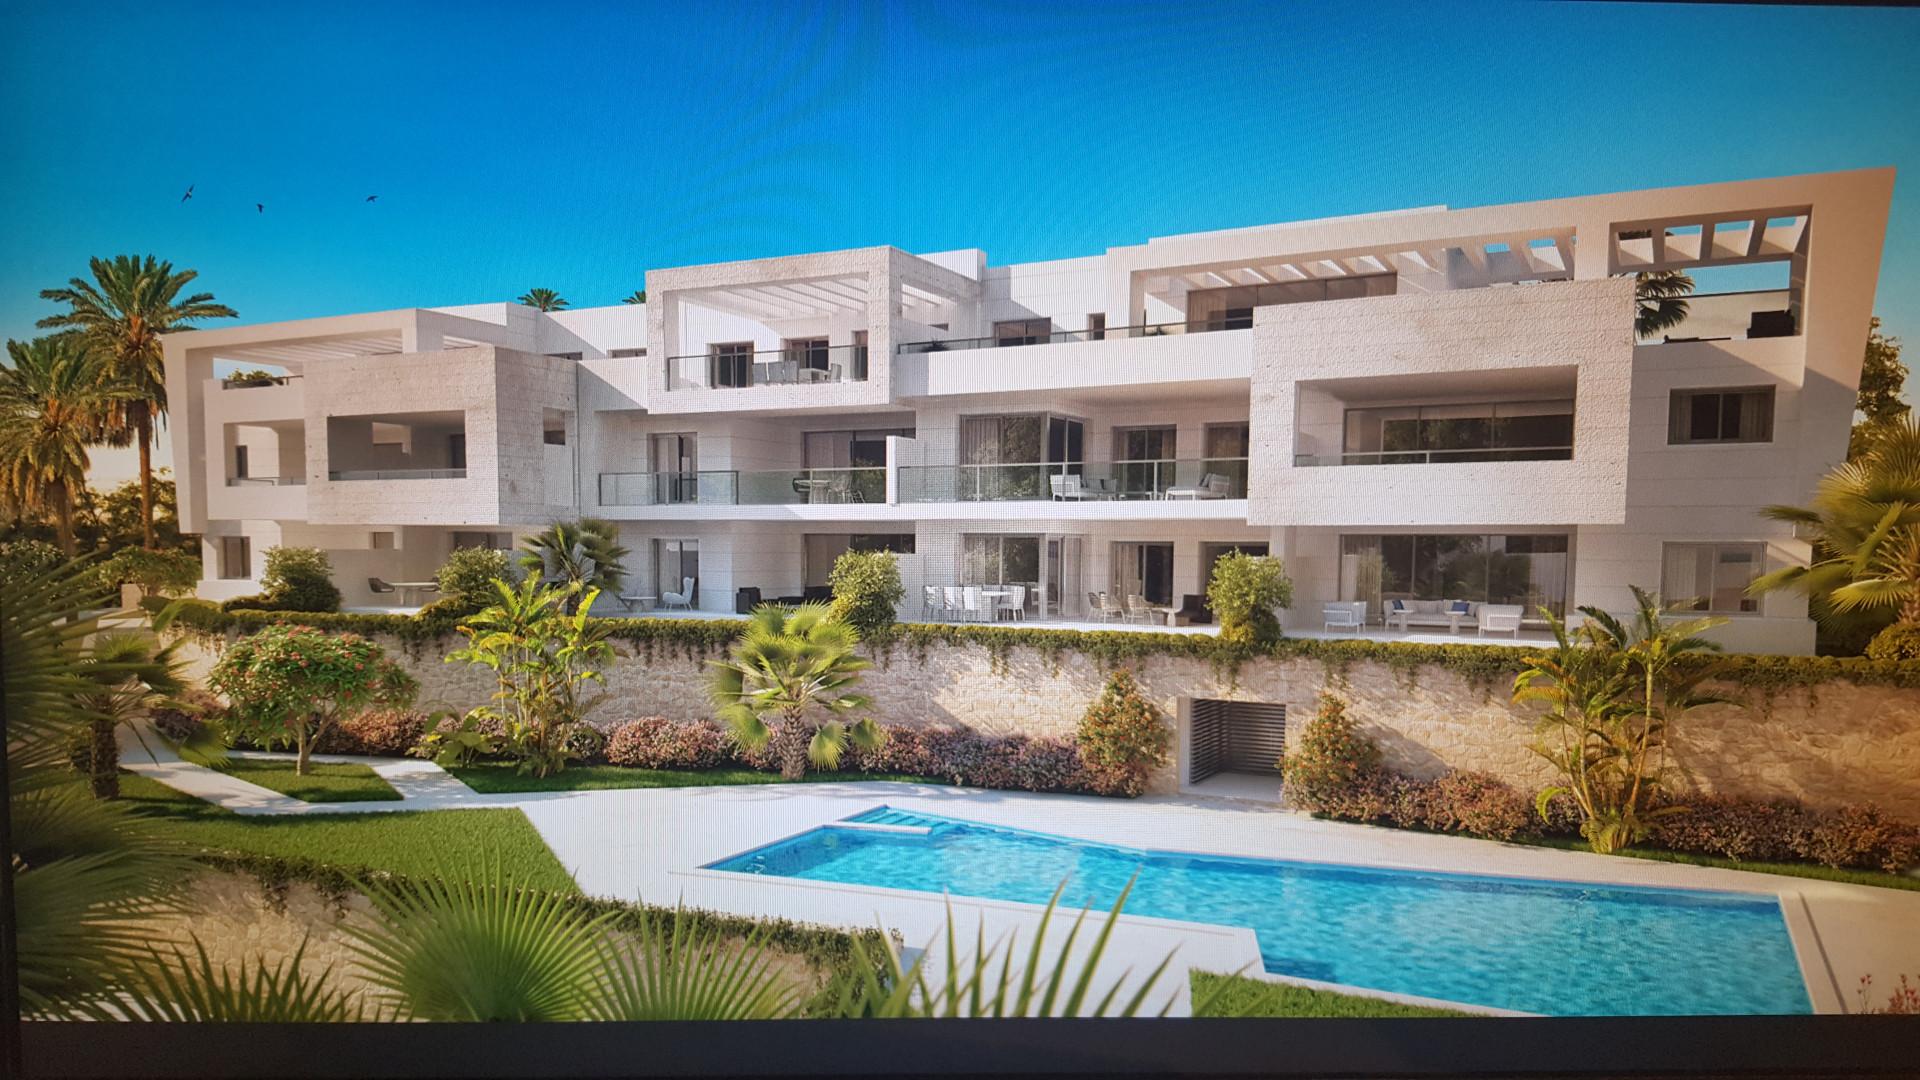 New modern contemporary frontline golf off plan development in Casares